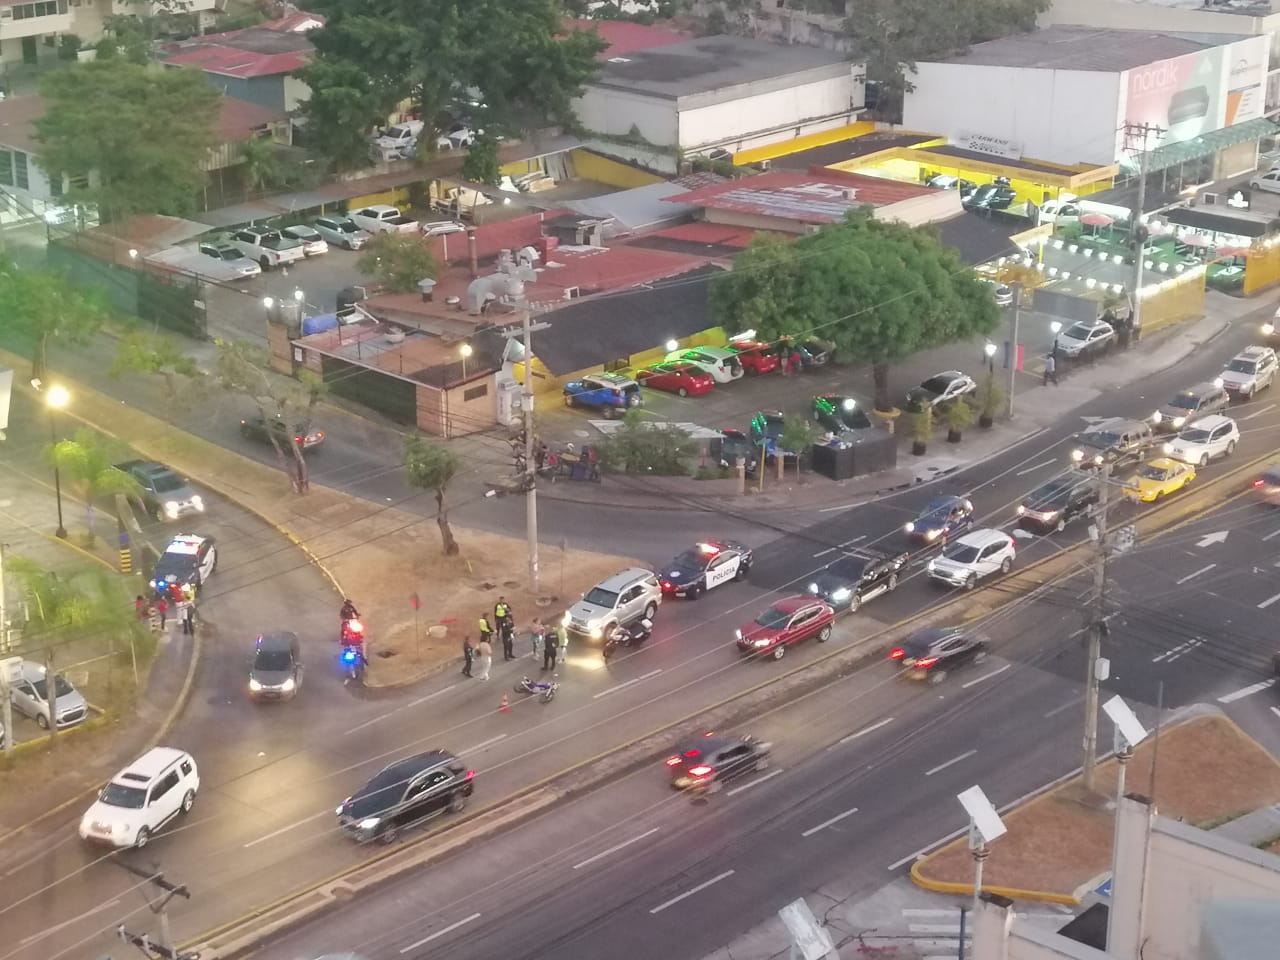 Roban planilla, huyen en moto y colisionan, pero abordan taxi para volver a escapar